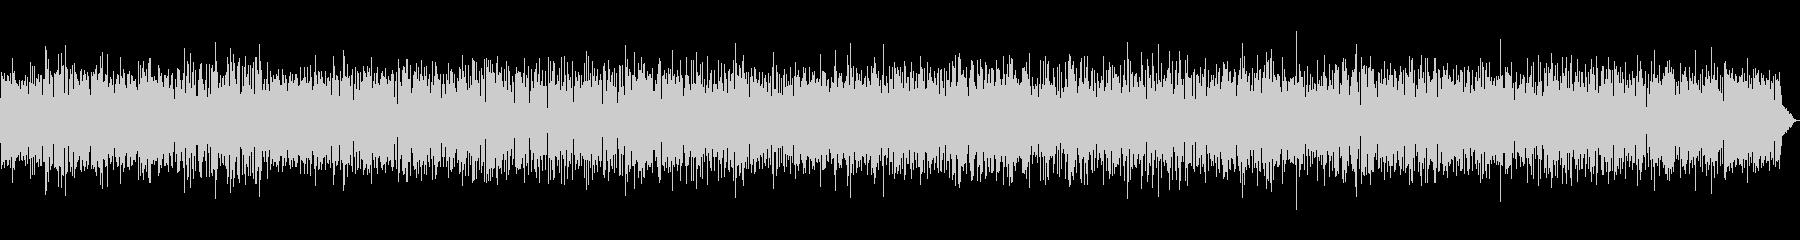 JAZZ|リッチなカフェBGM・クールの未再生の波形